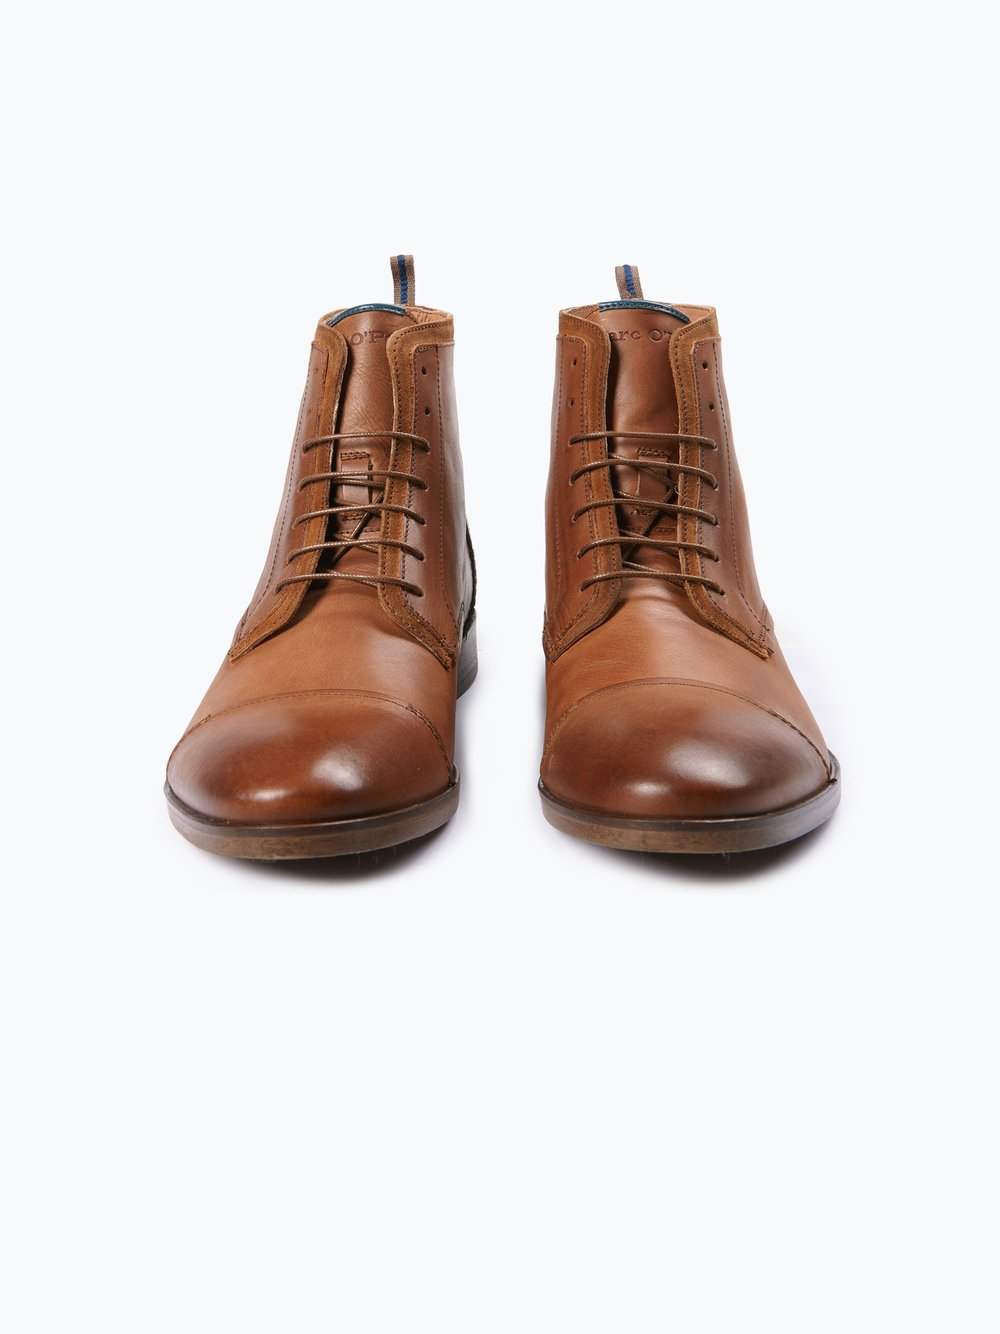 new style 4df71 d5634 Marc O'Polo Herren Boots aus Leder online kaufen | VANGRAAF.COM